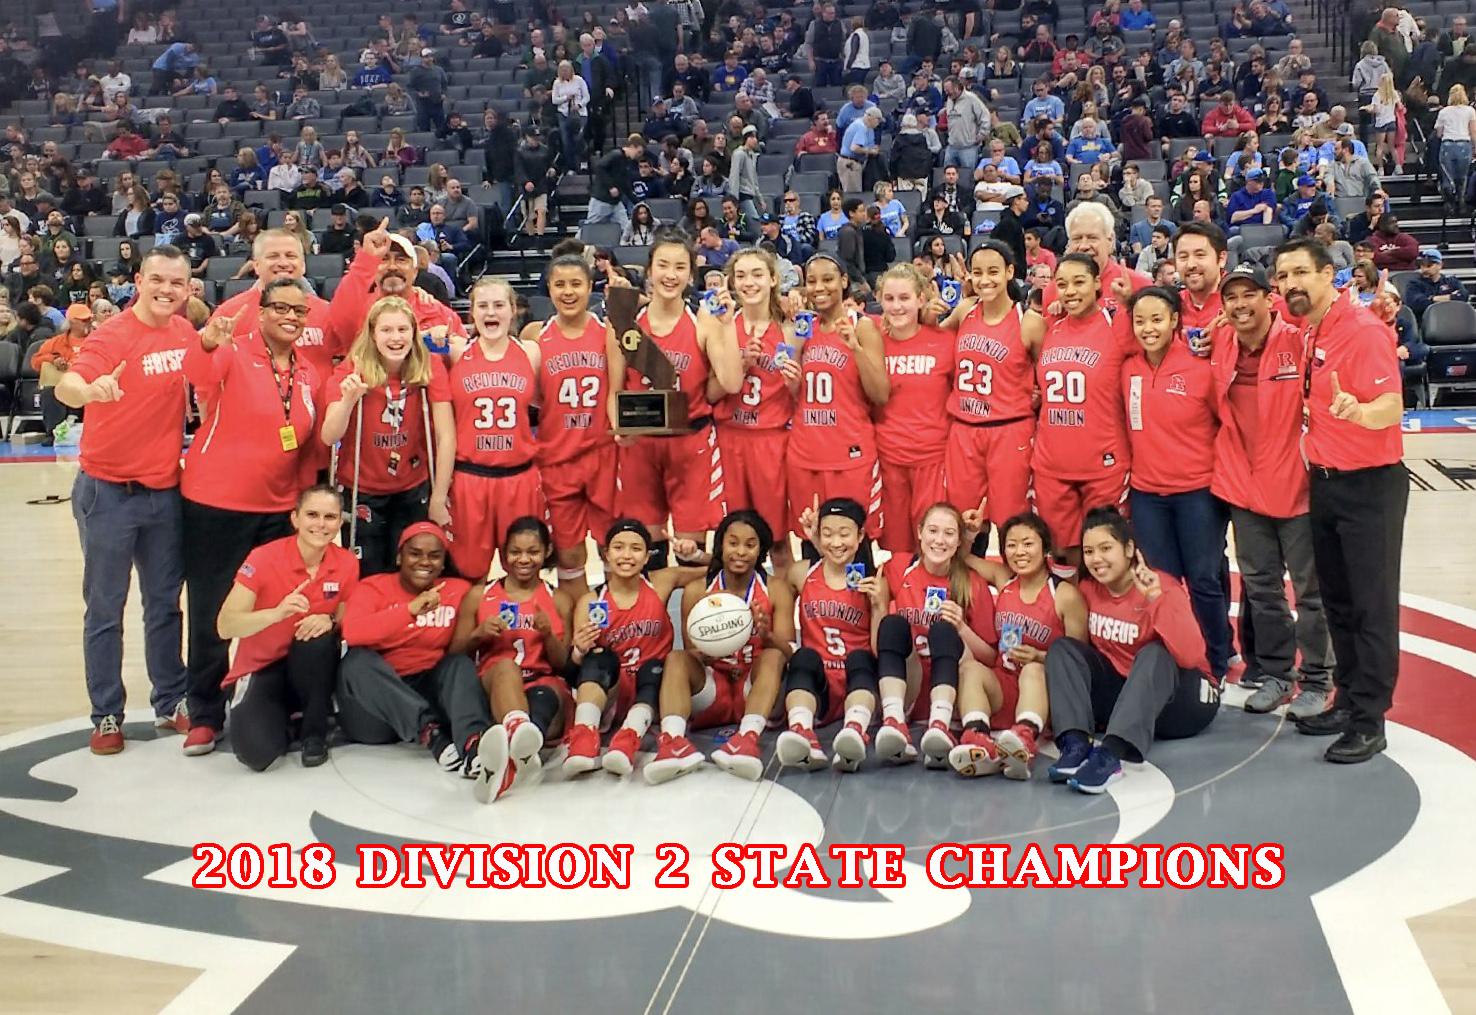 2018 CIF State Champions